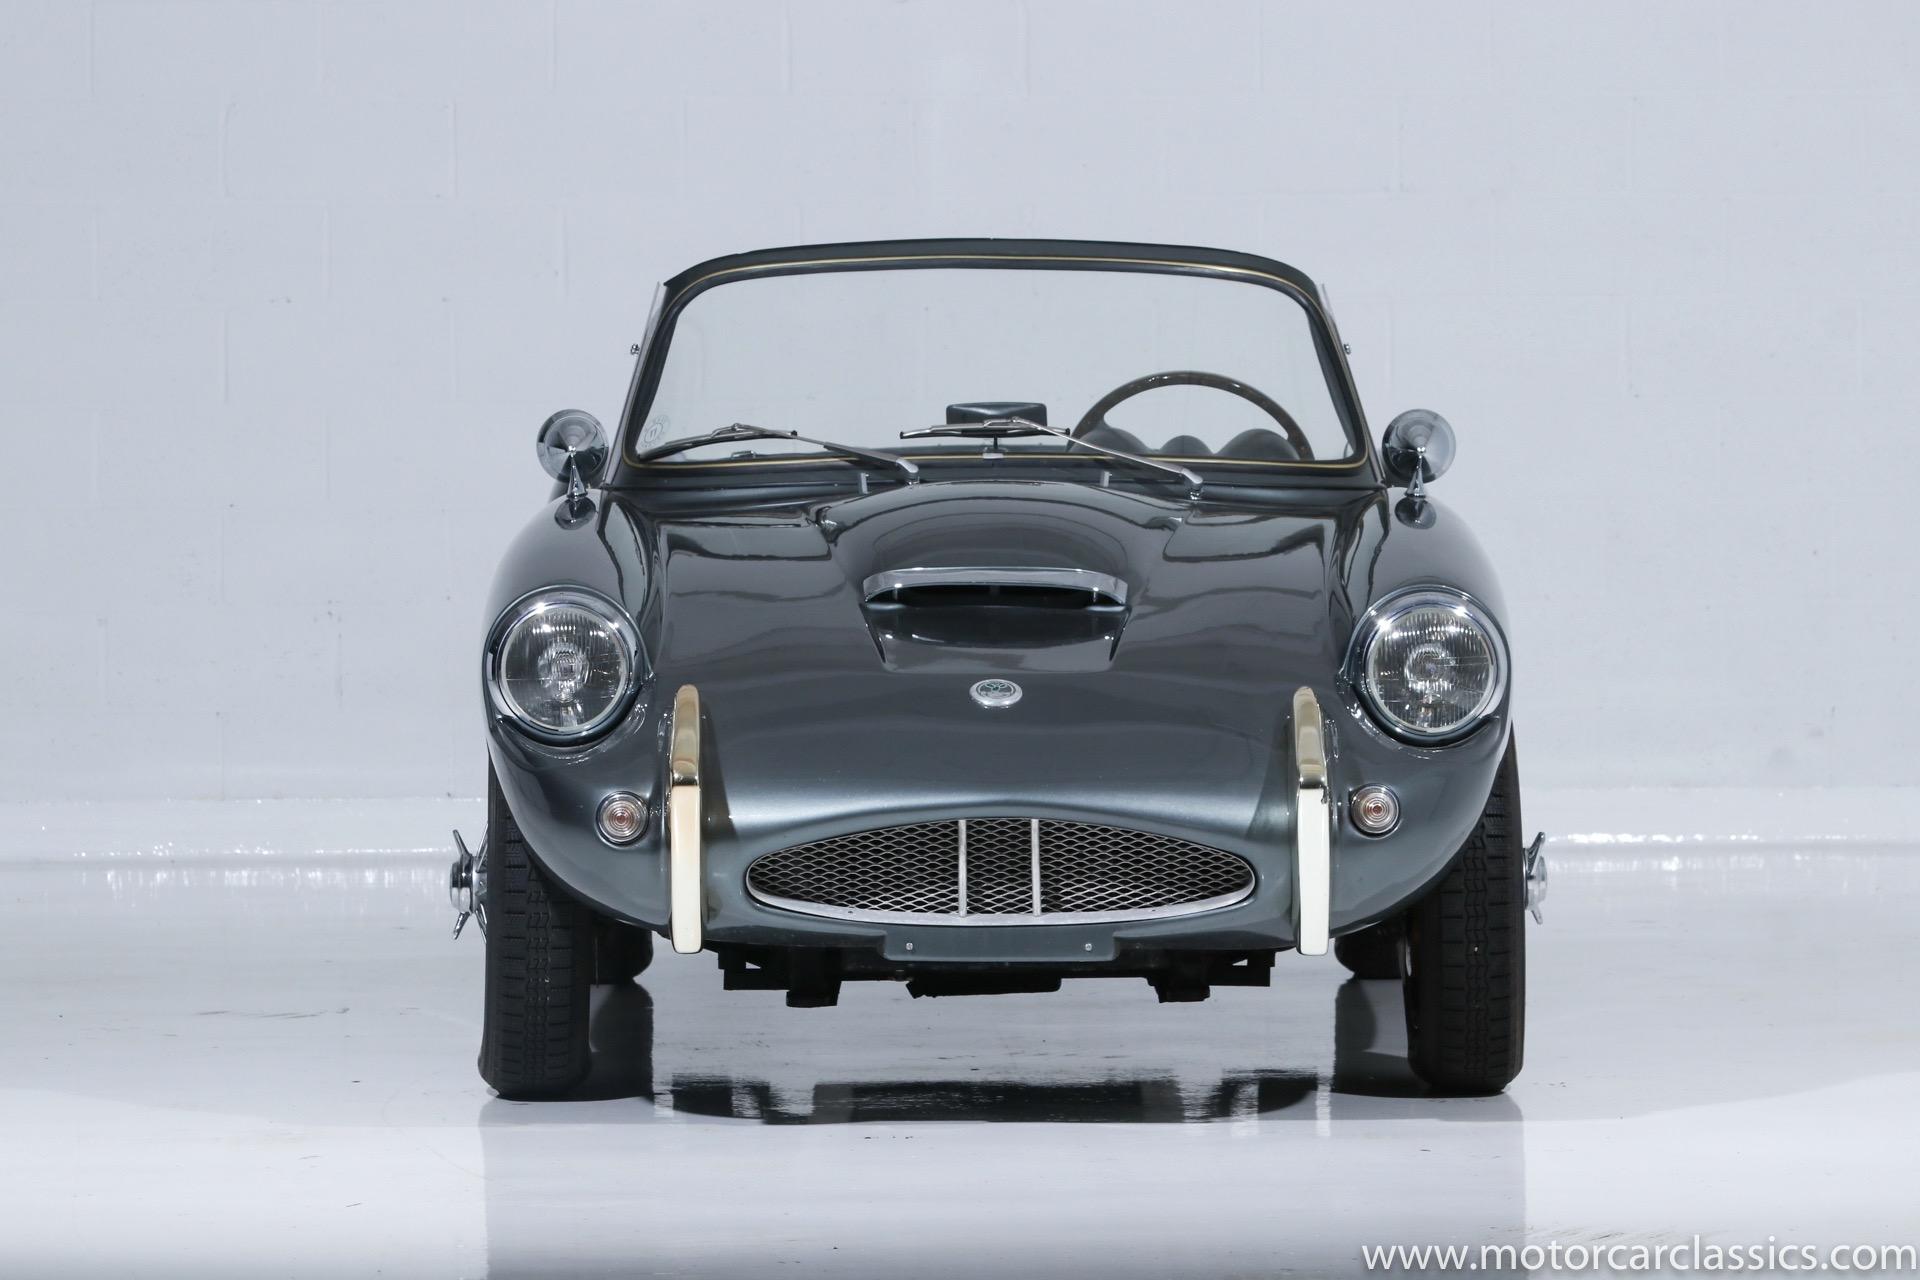 1963 Reliant Sabra Convertible RWD